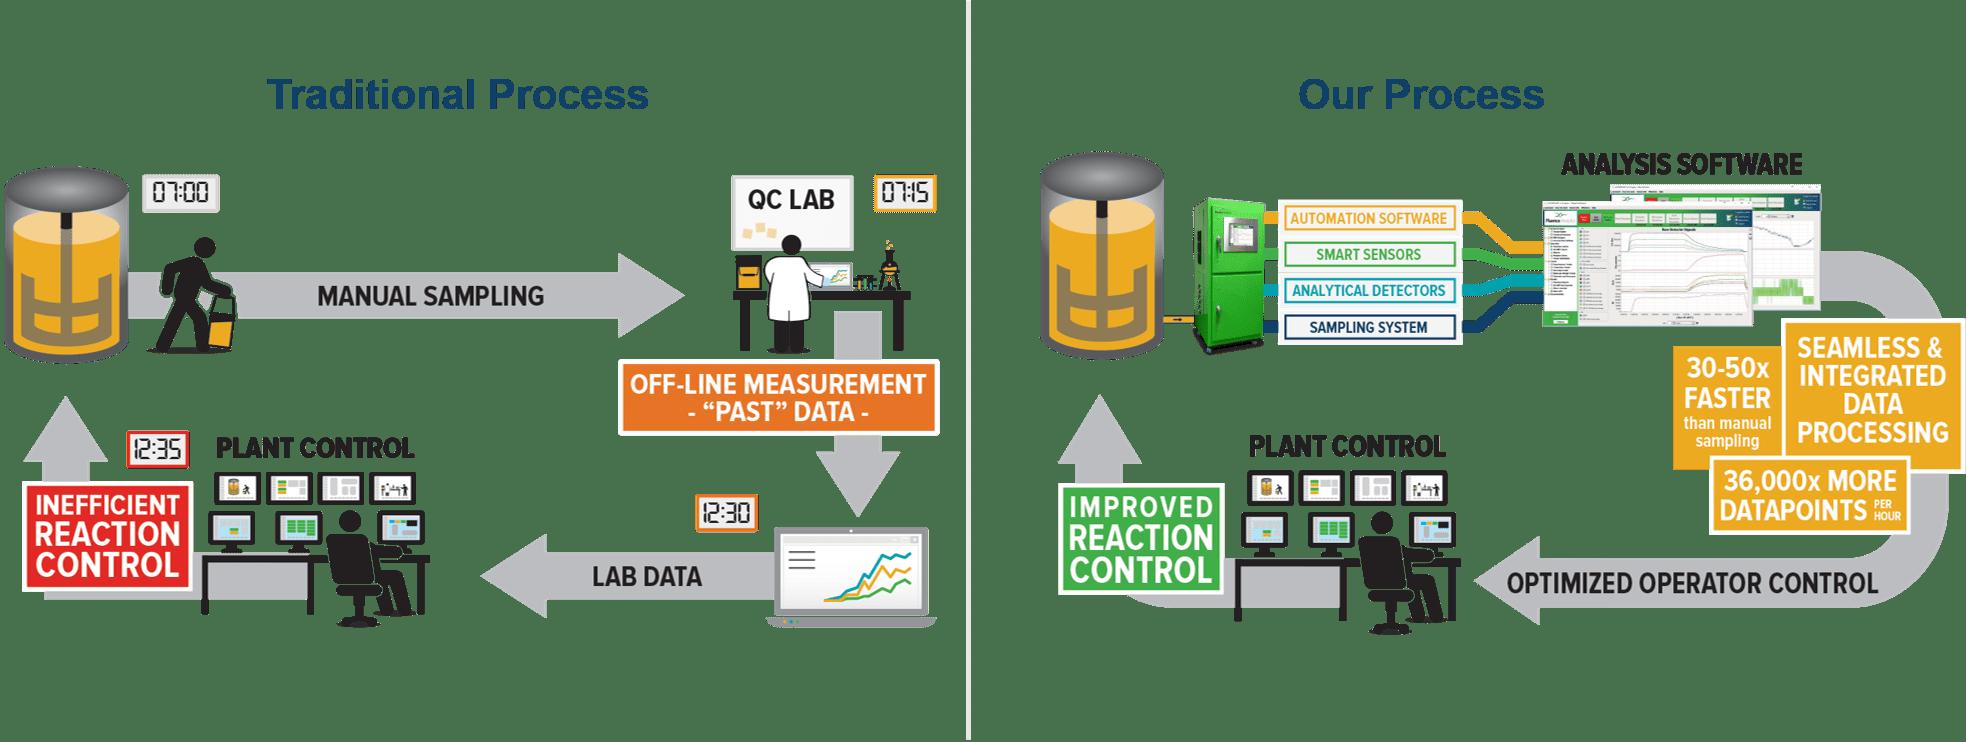 Traditional method of measuring versus the Fluence Analytics process.